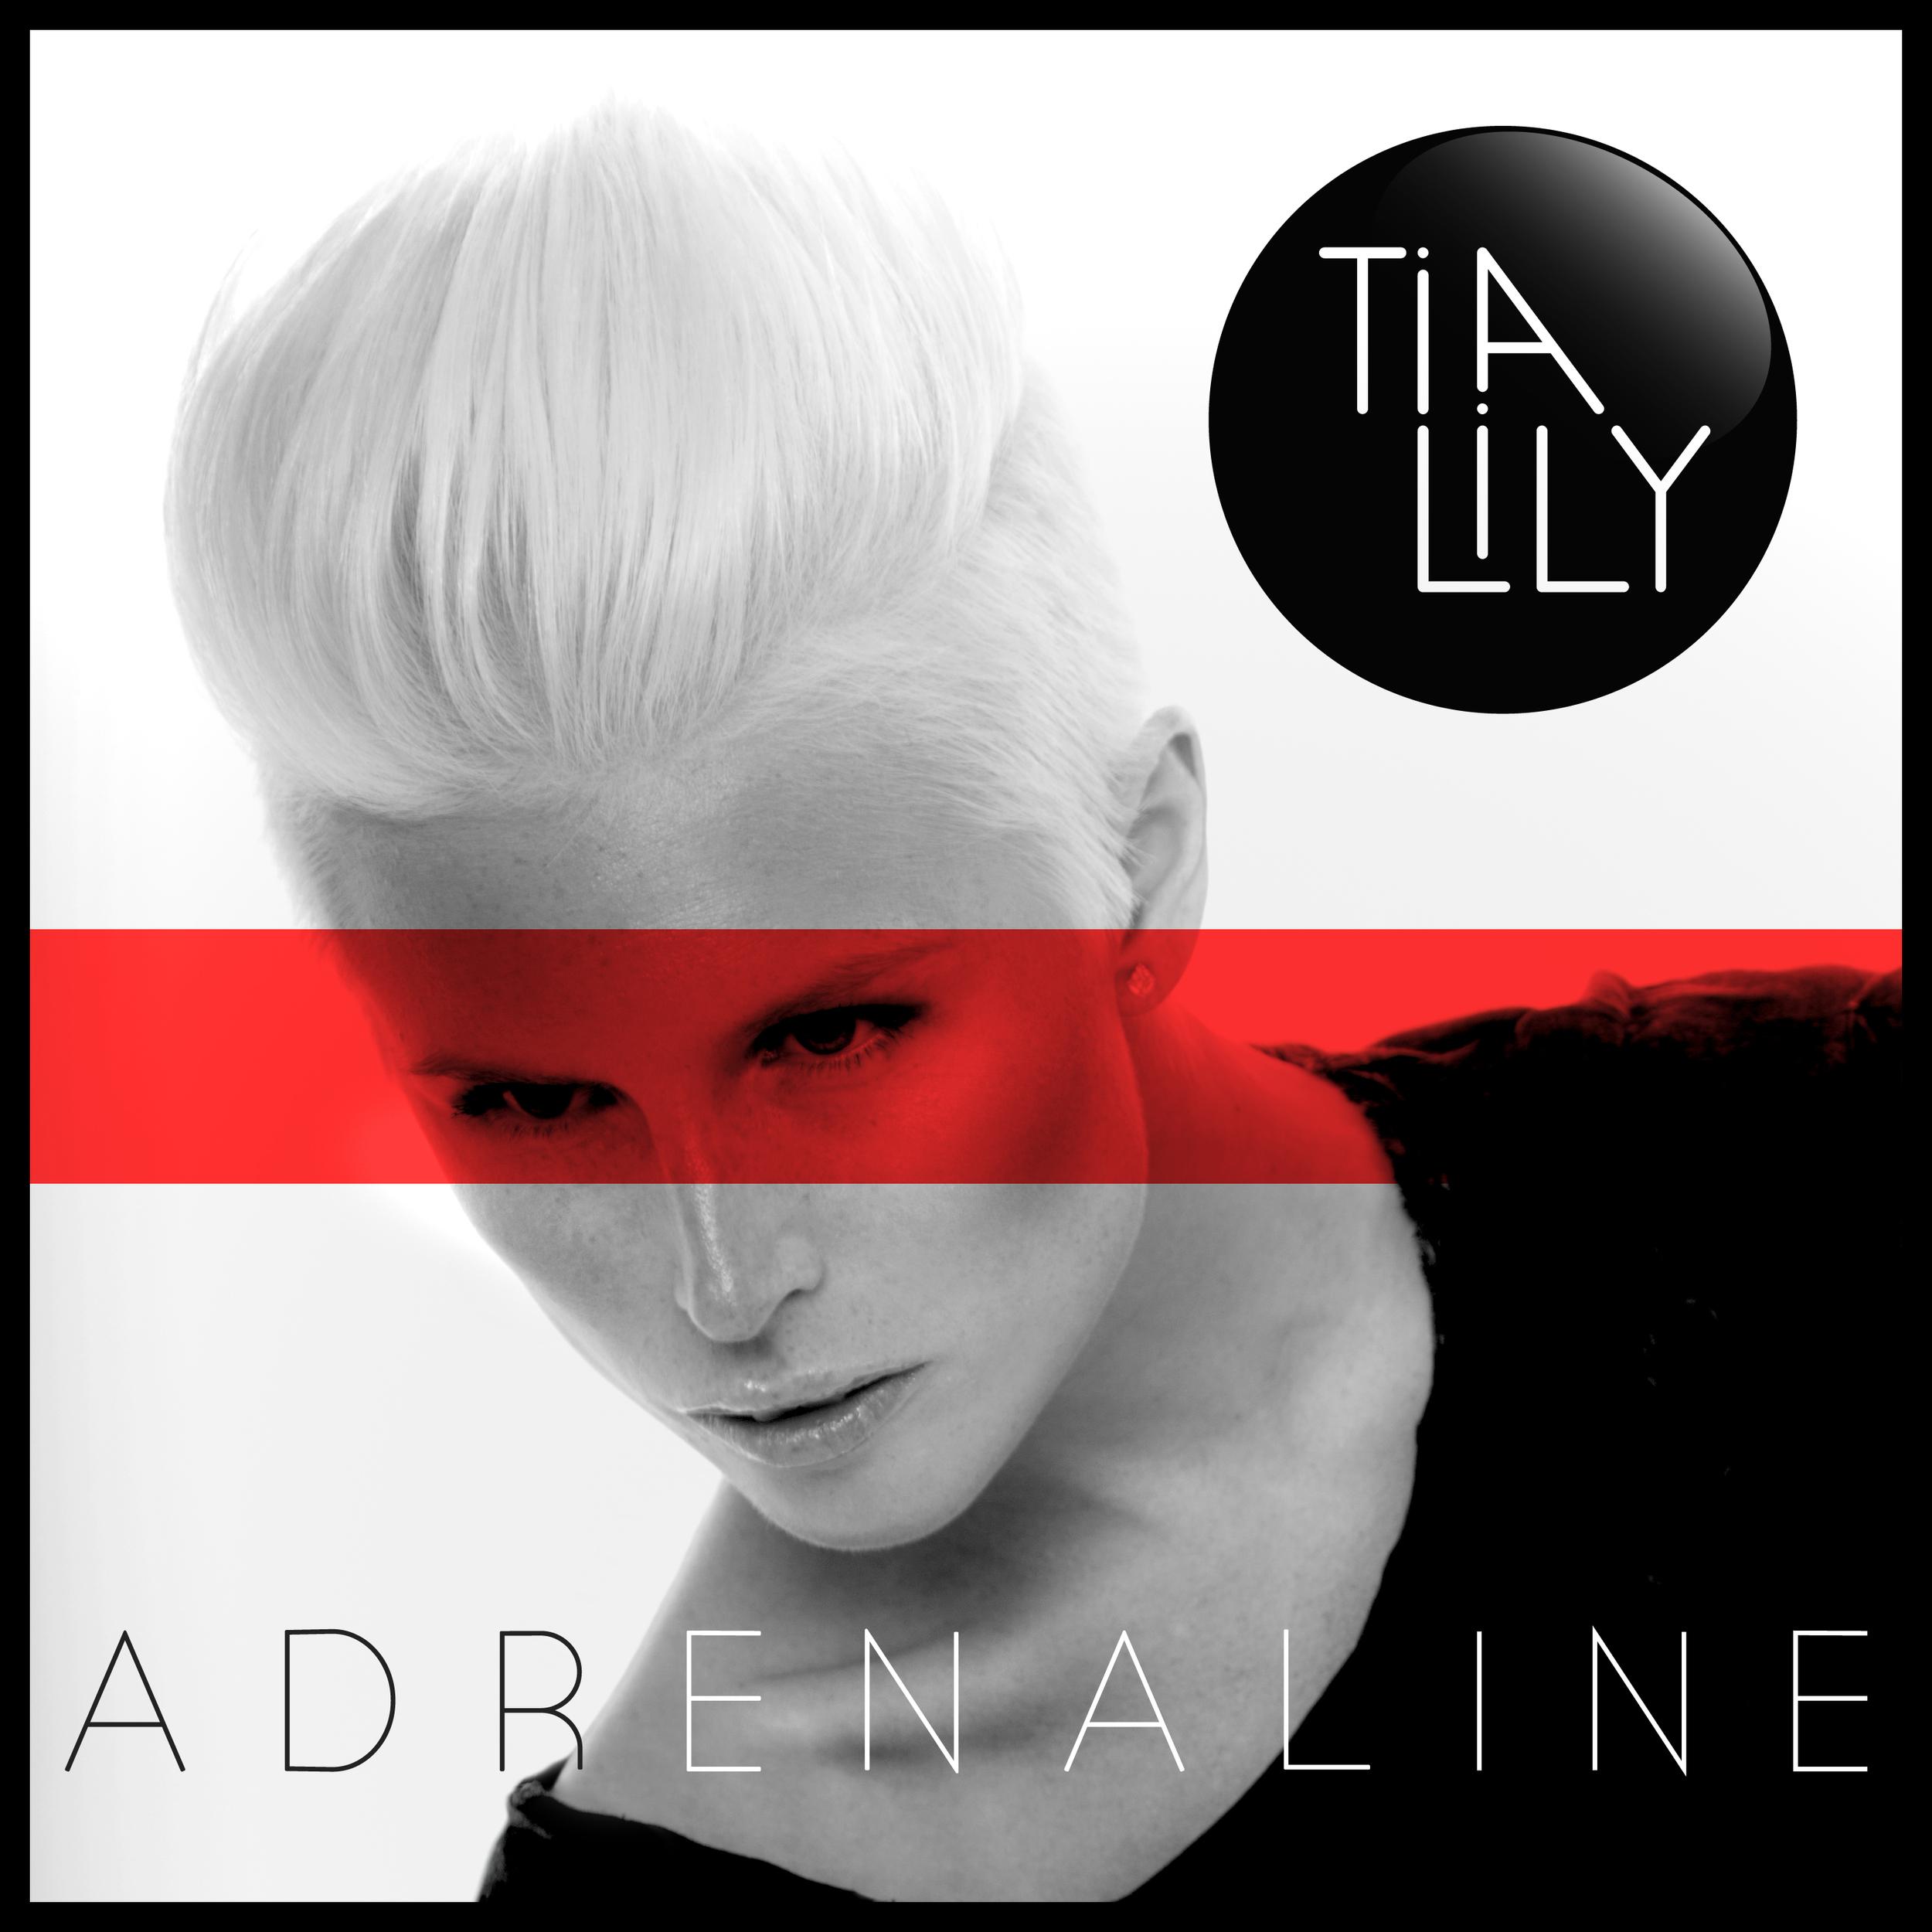 Tia Lily Adrenaline Cover